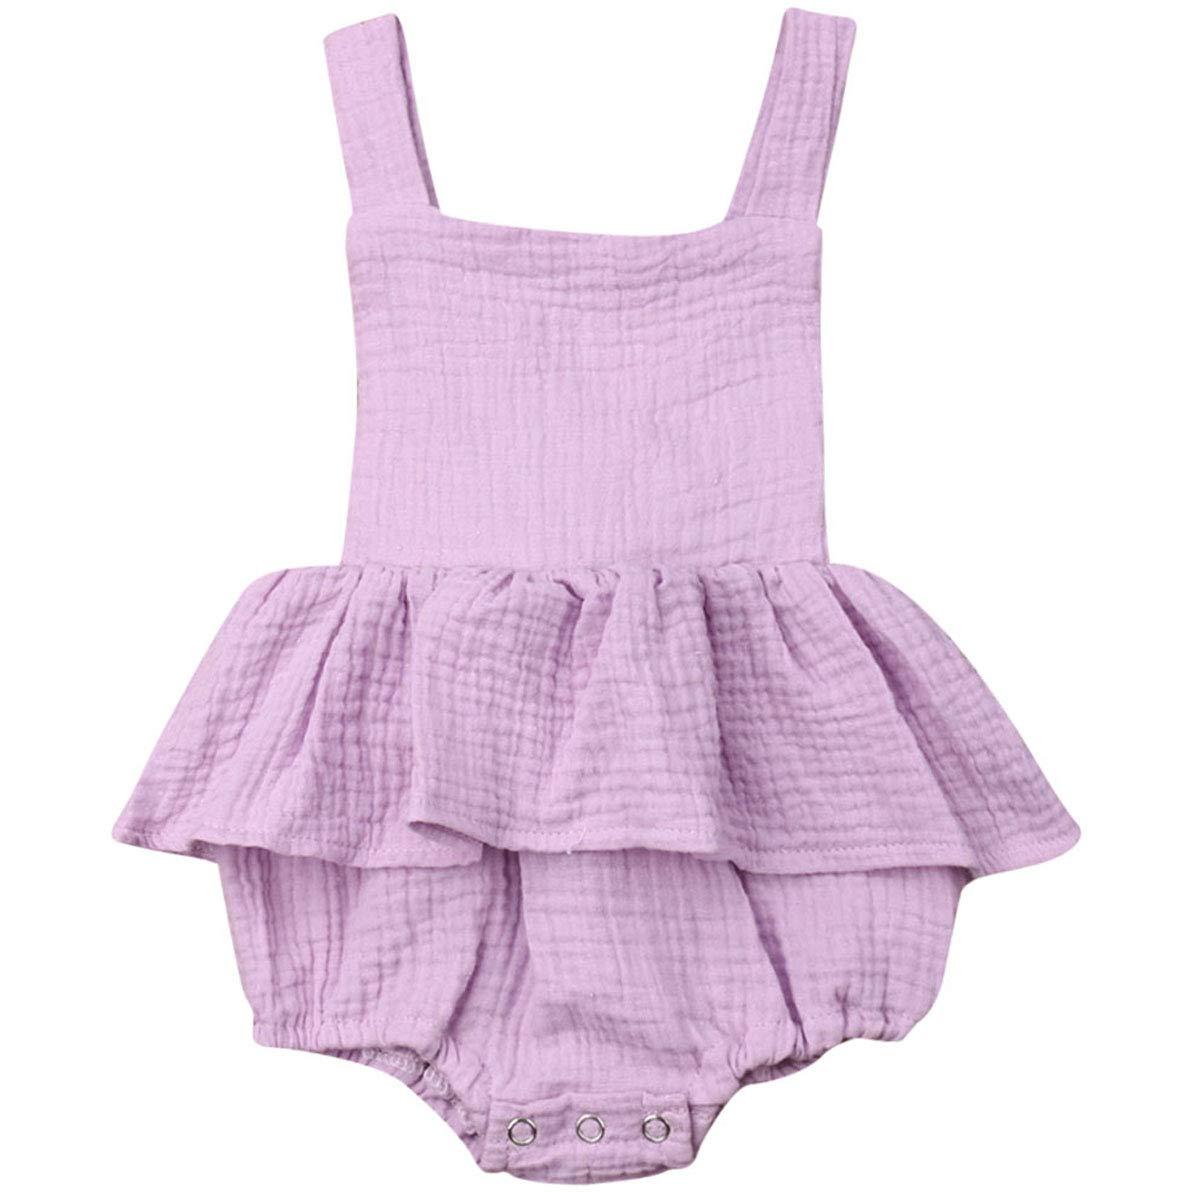 Newborn Baby Girls Sleeveless Ruffled Romper Bodysuit Cotton Jumpsuit Romper Dress Baby Girl Dresses Outfit